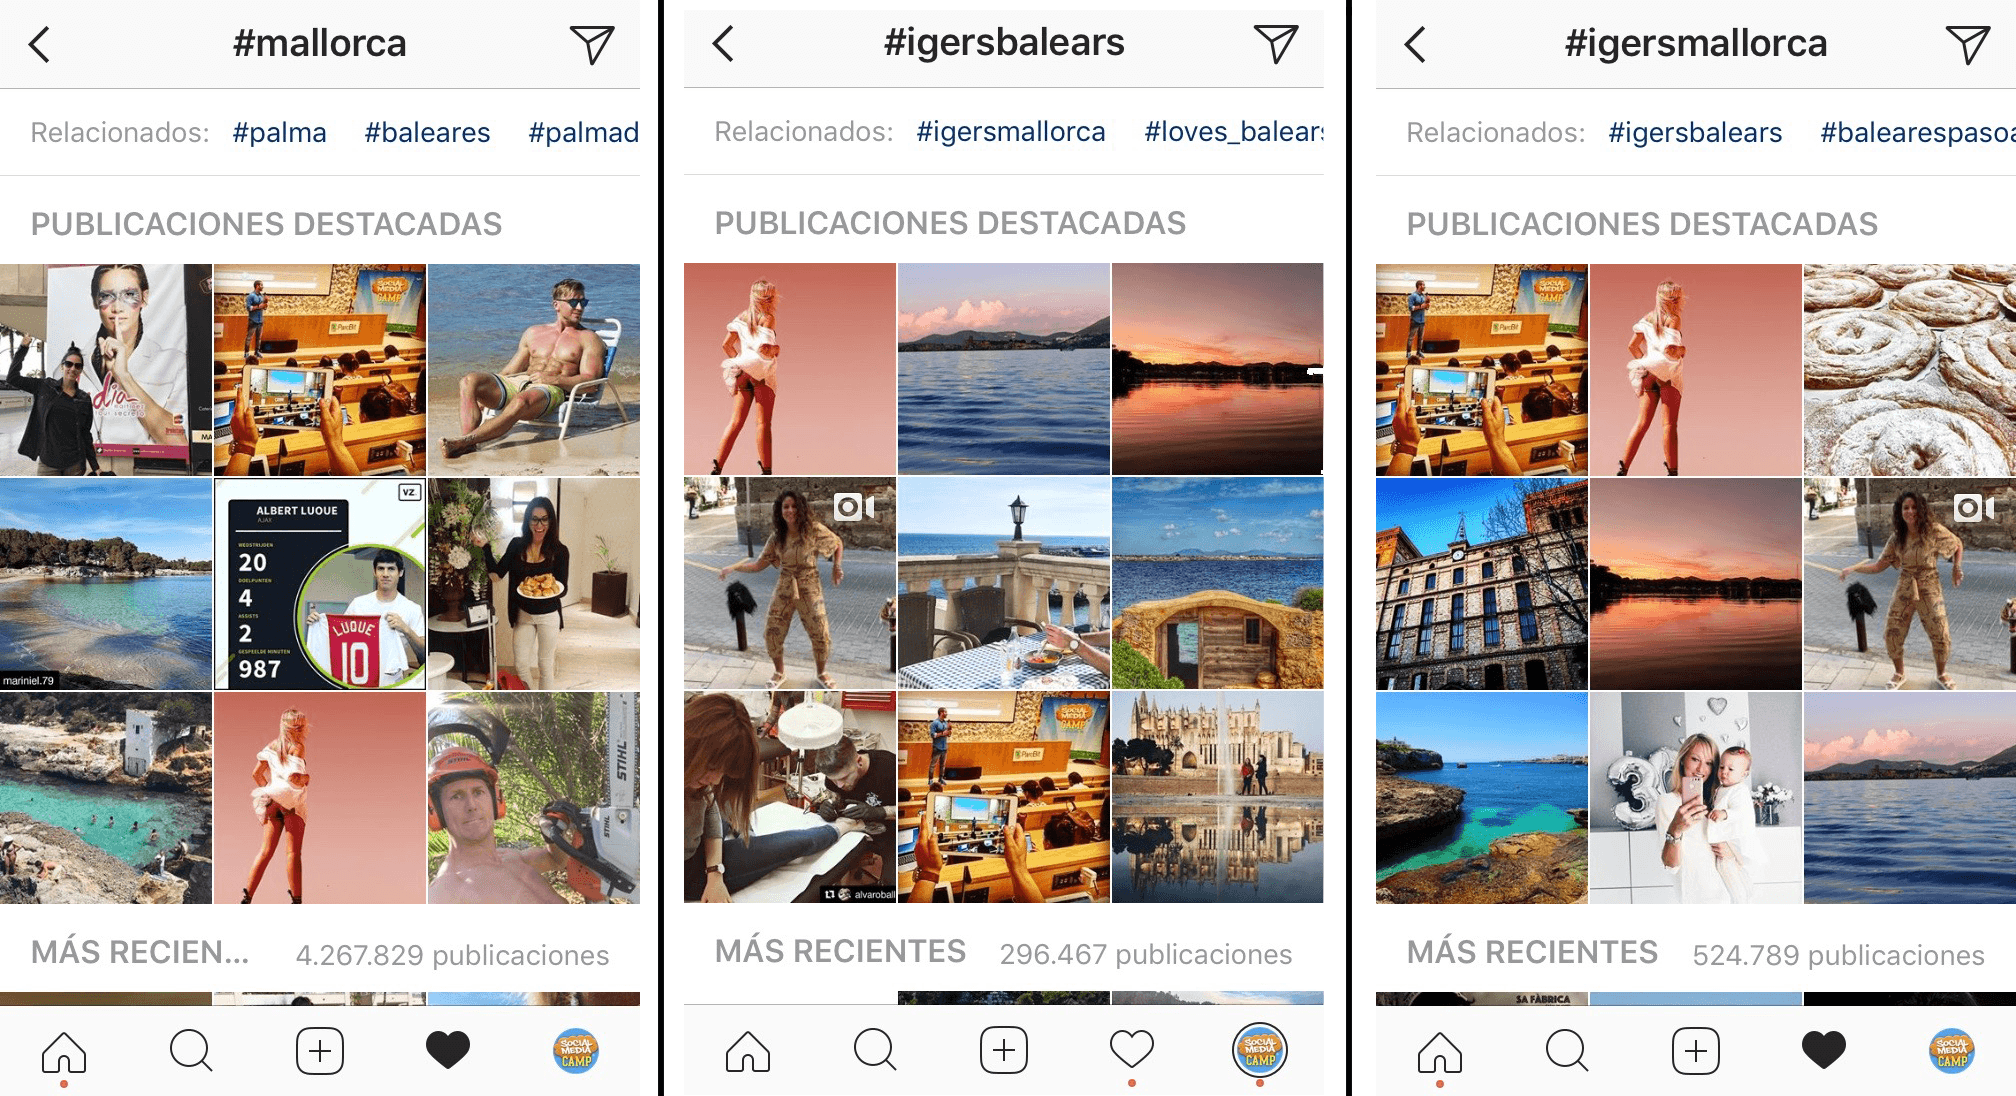 algoritmo instagram imagenes destacadas foto destacada en instagram